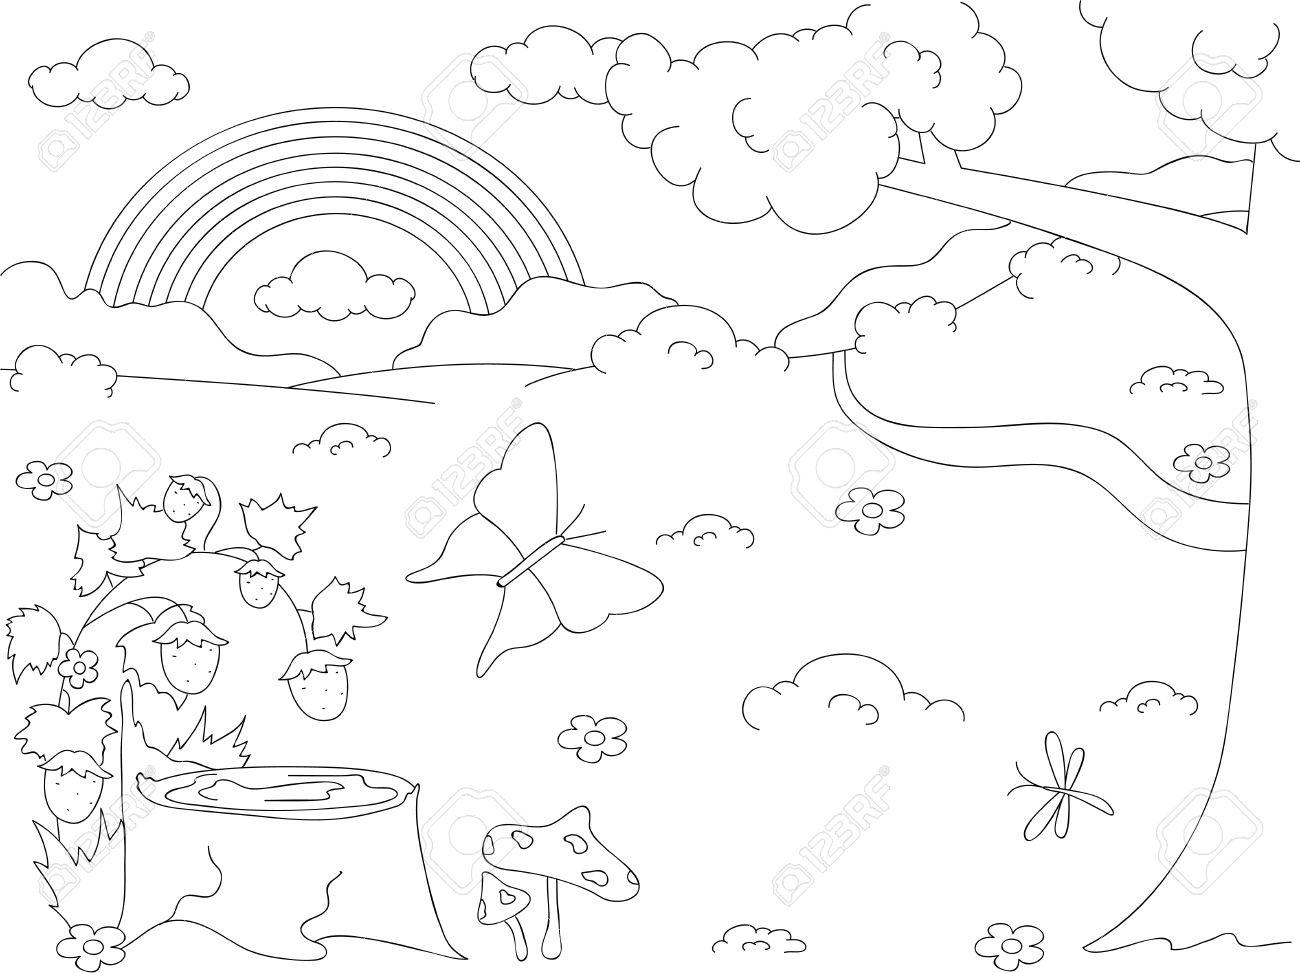 Stub coloring #18, Download drawings